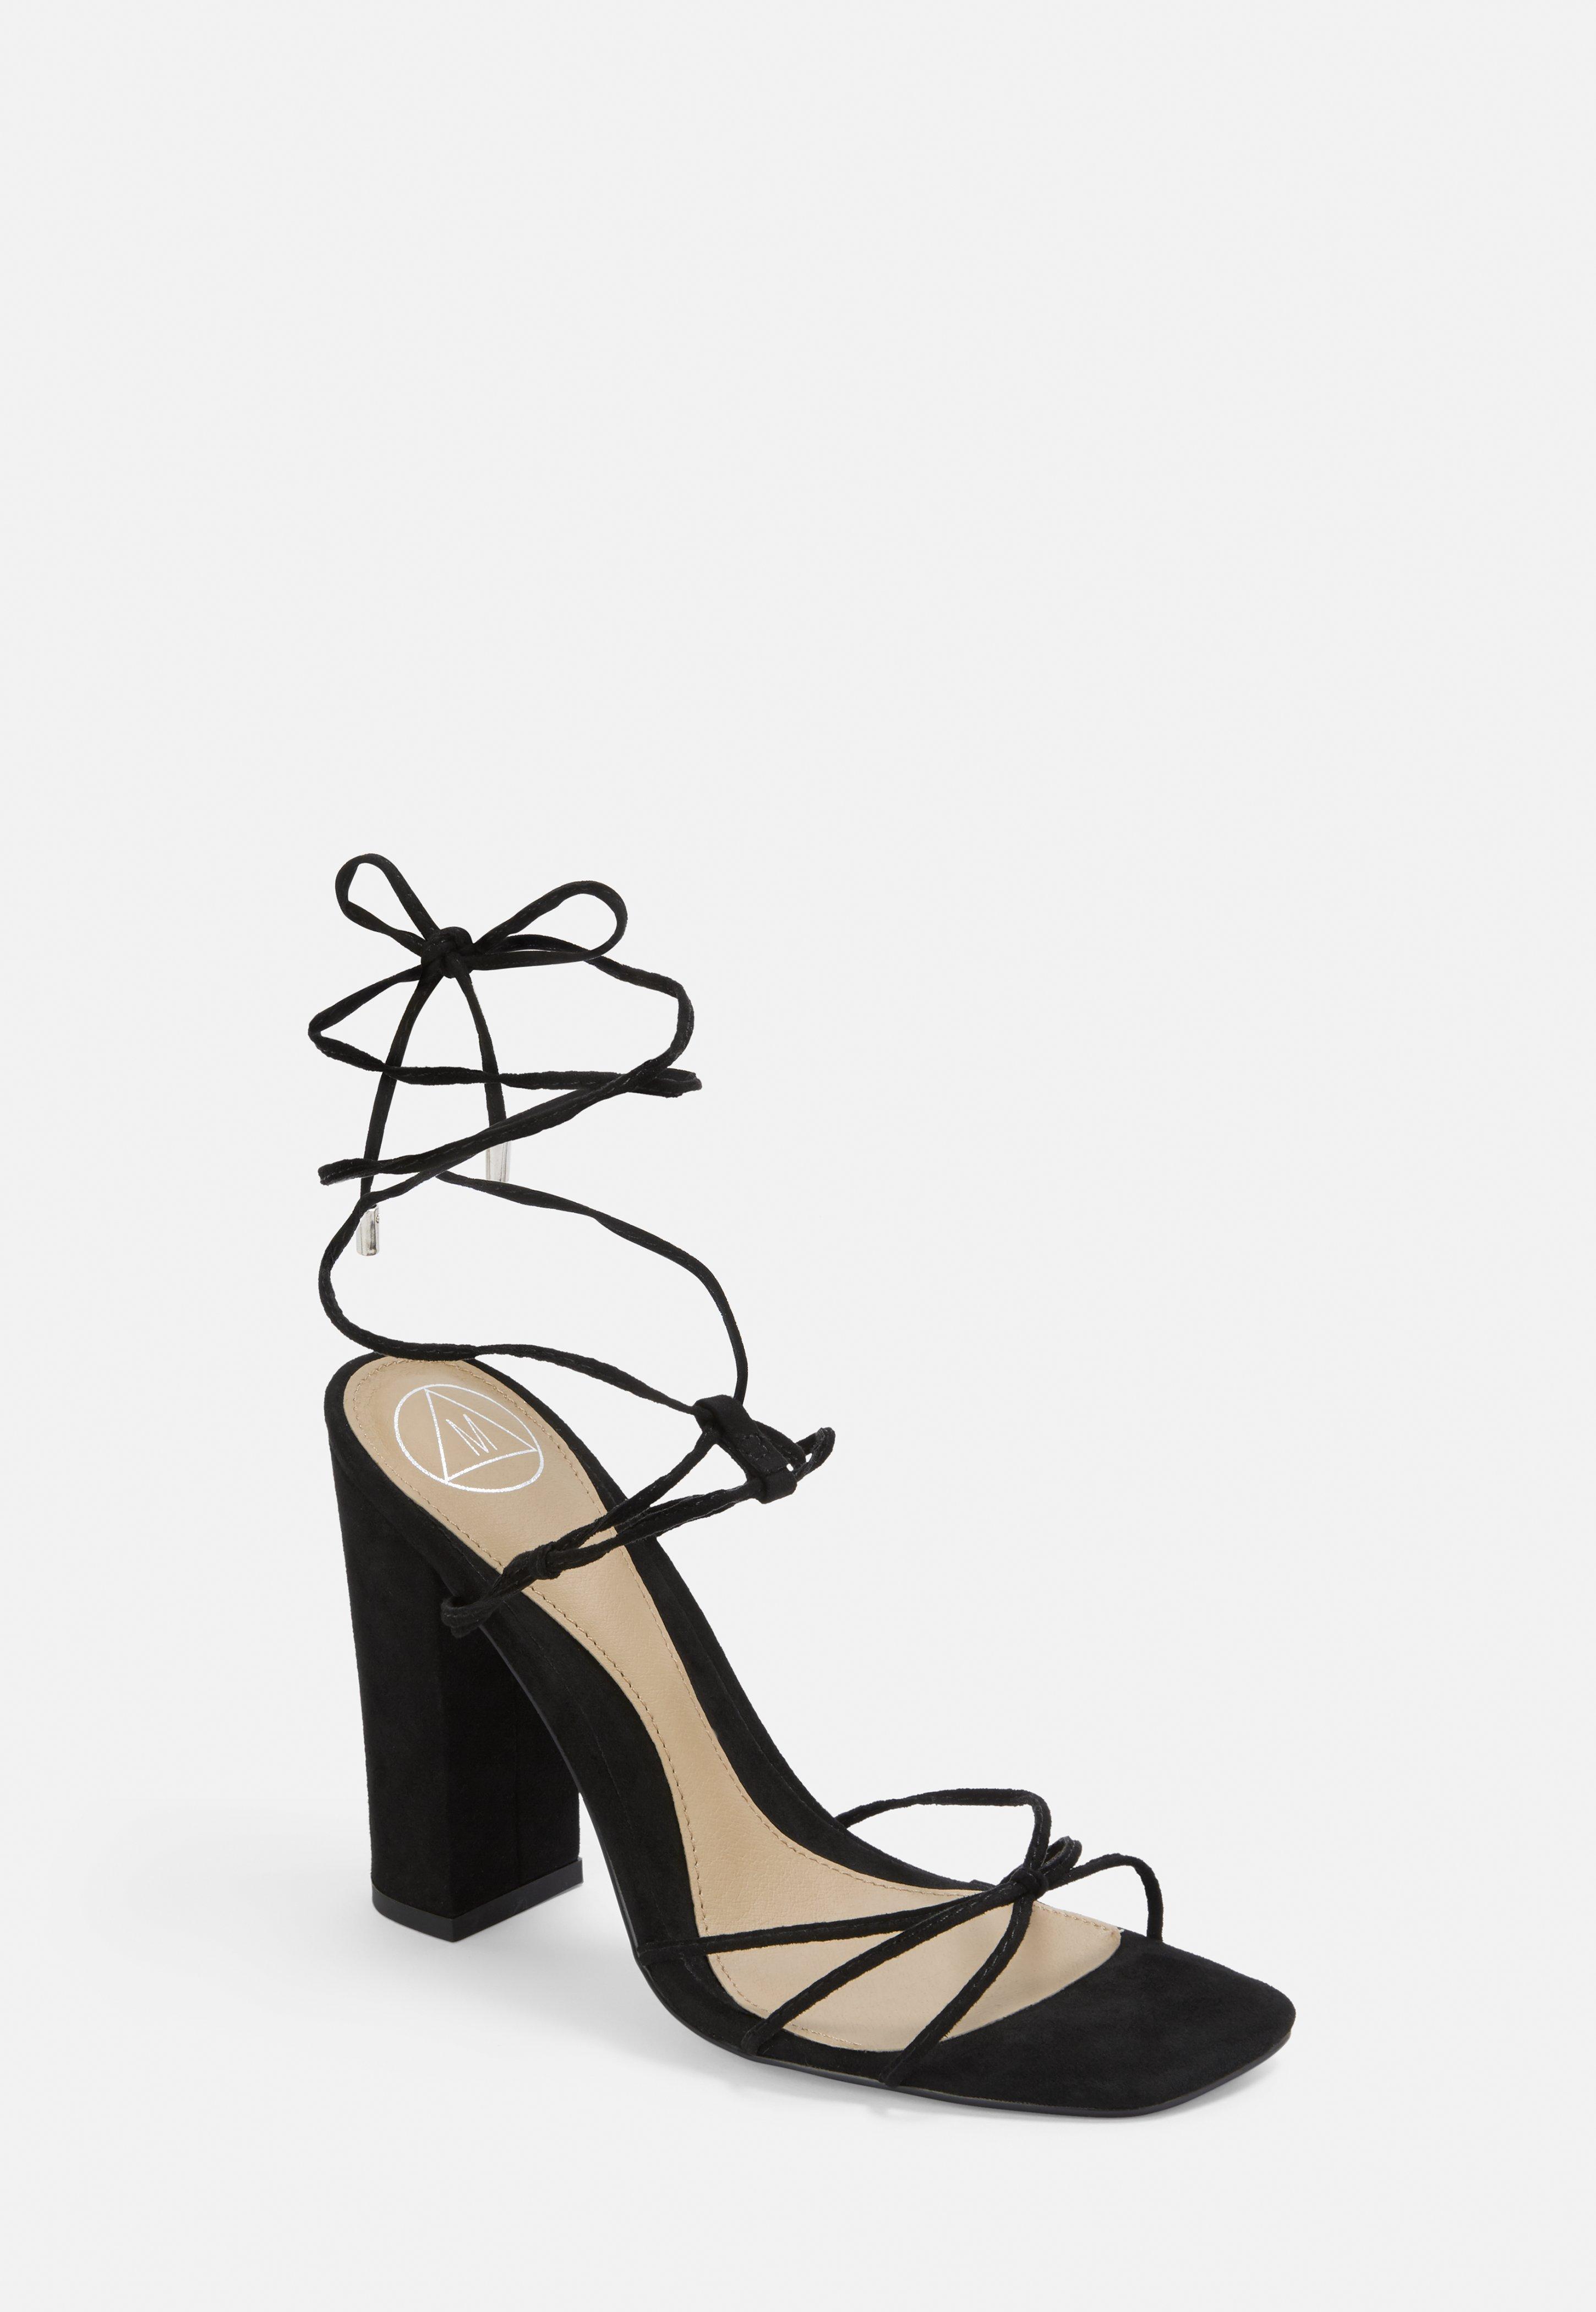 Sandals Strap Heel Tie Black Heeled Block tsQrCdh